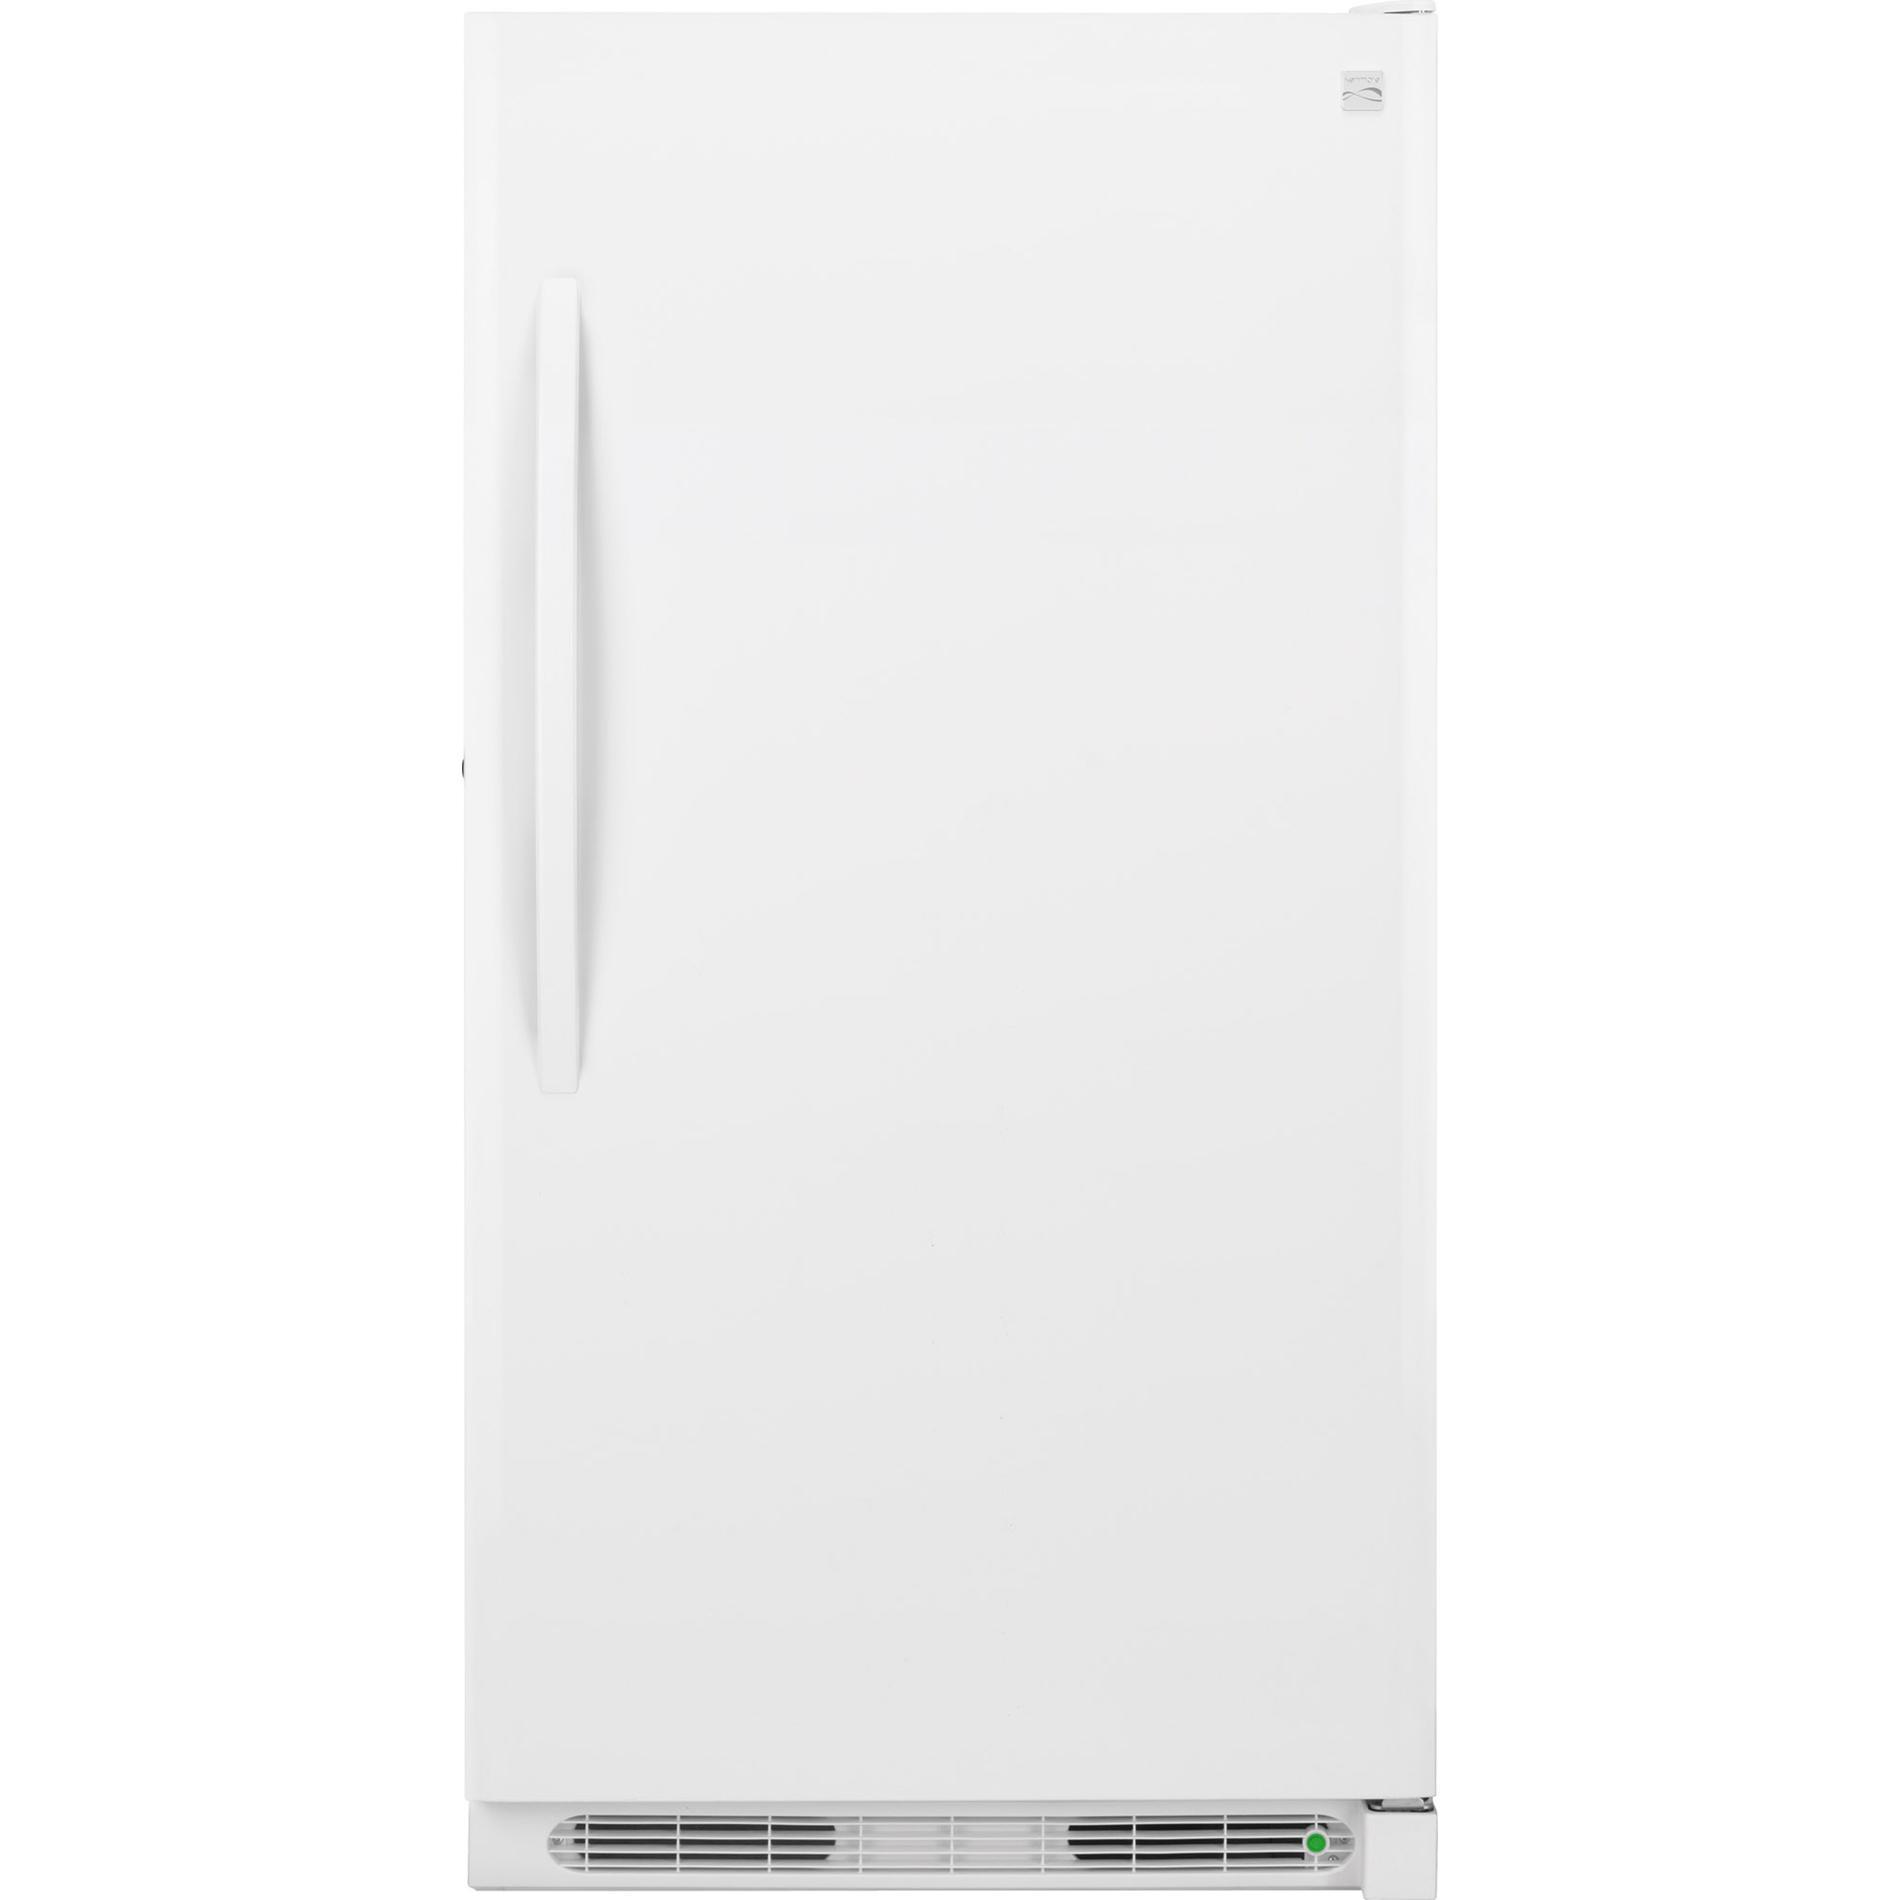 Upright Freezers Stand Up Freezers Sears